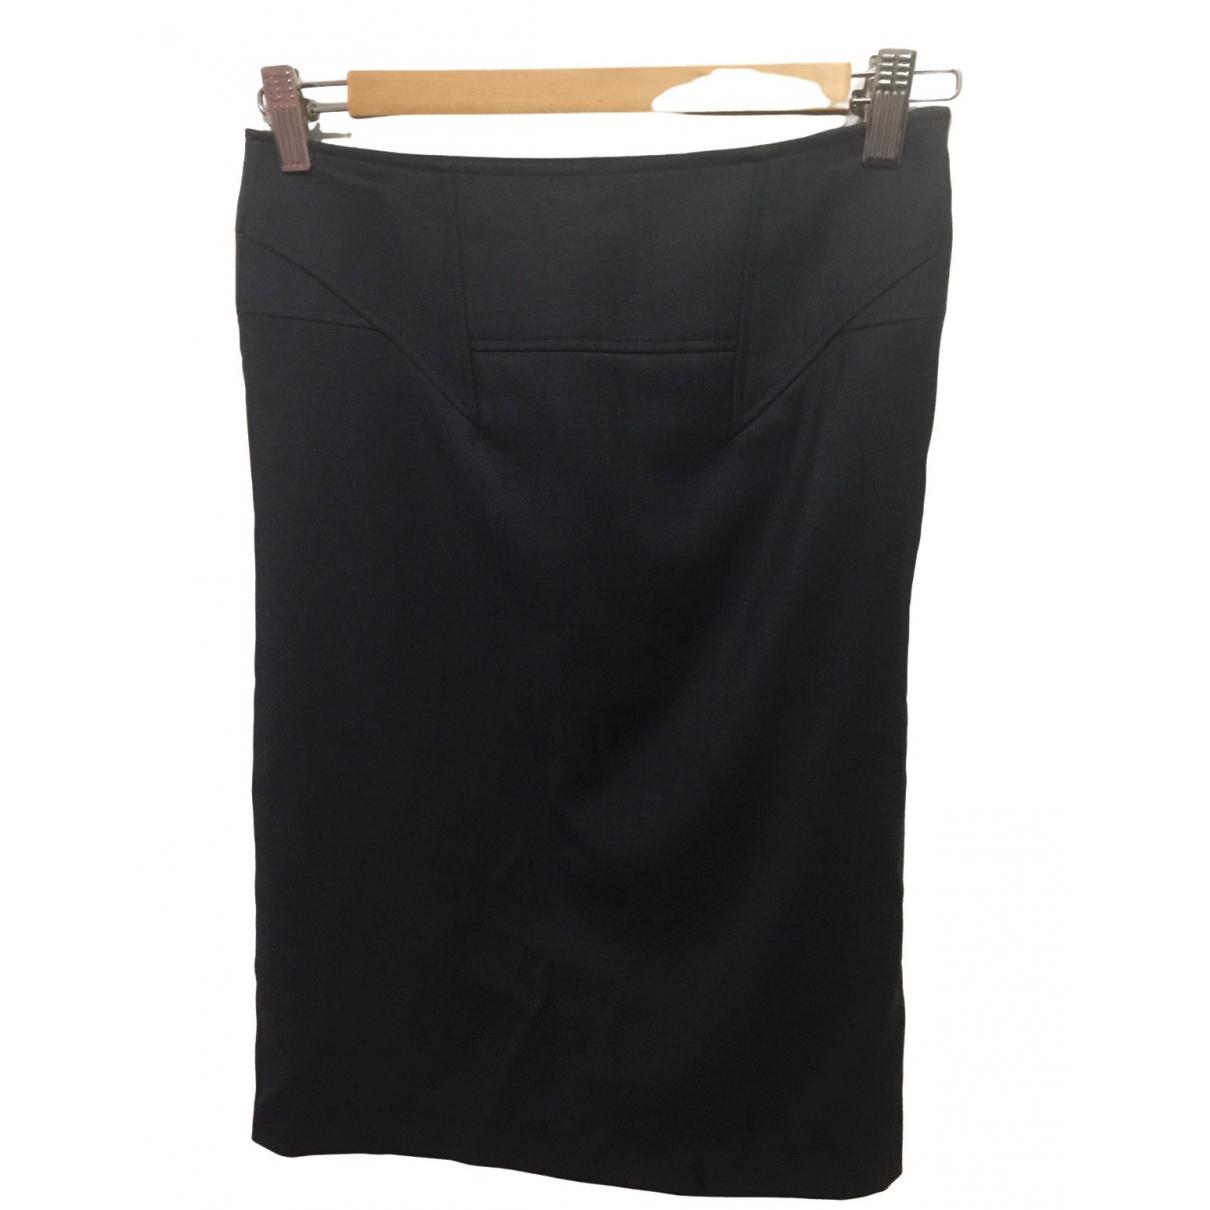 Reiss \N Anthracite Wool skirt for Women 2 US